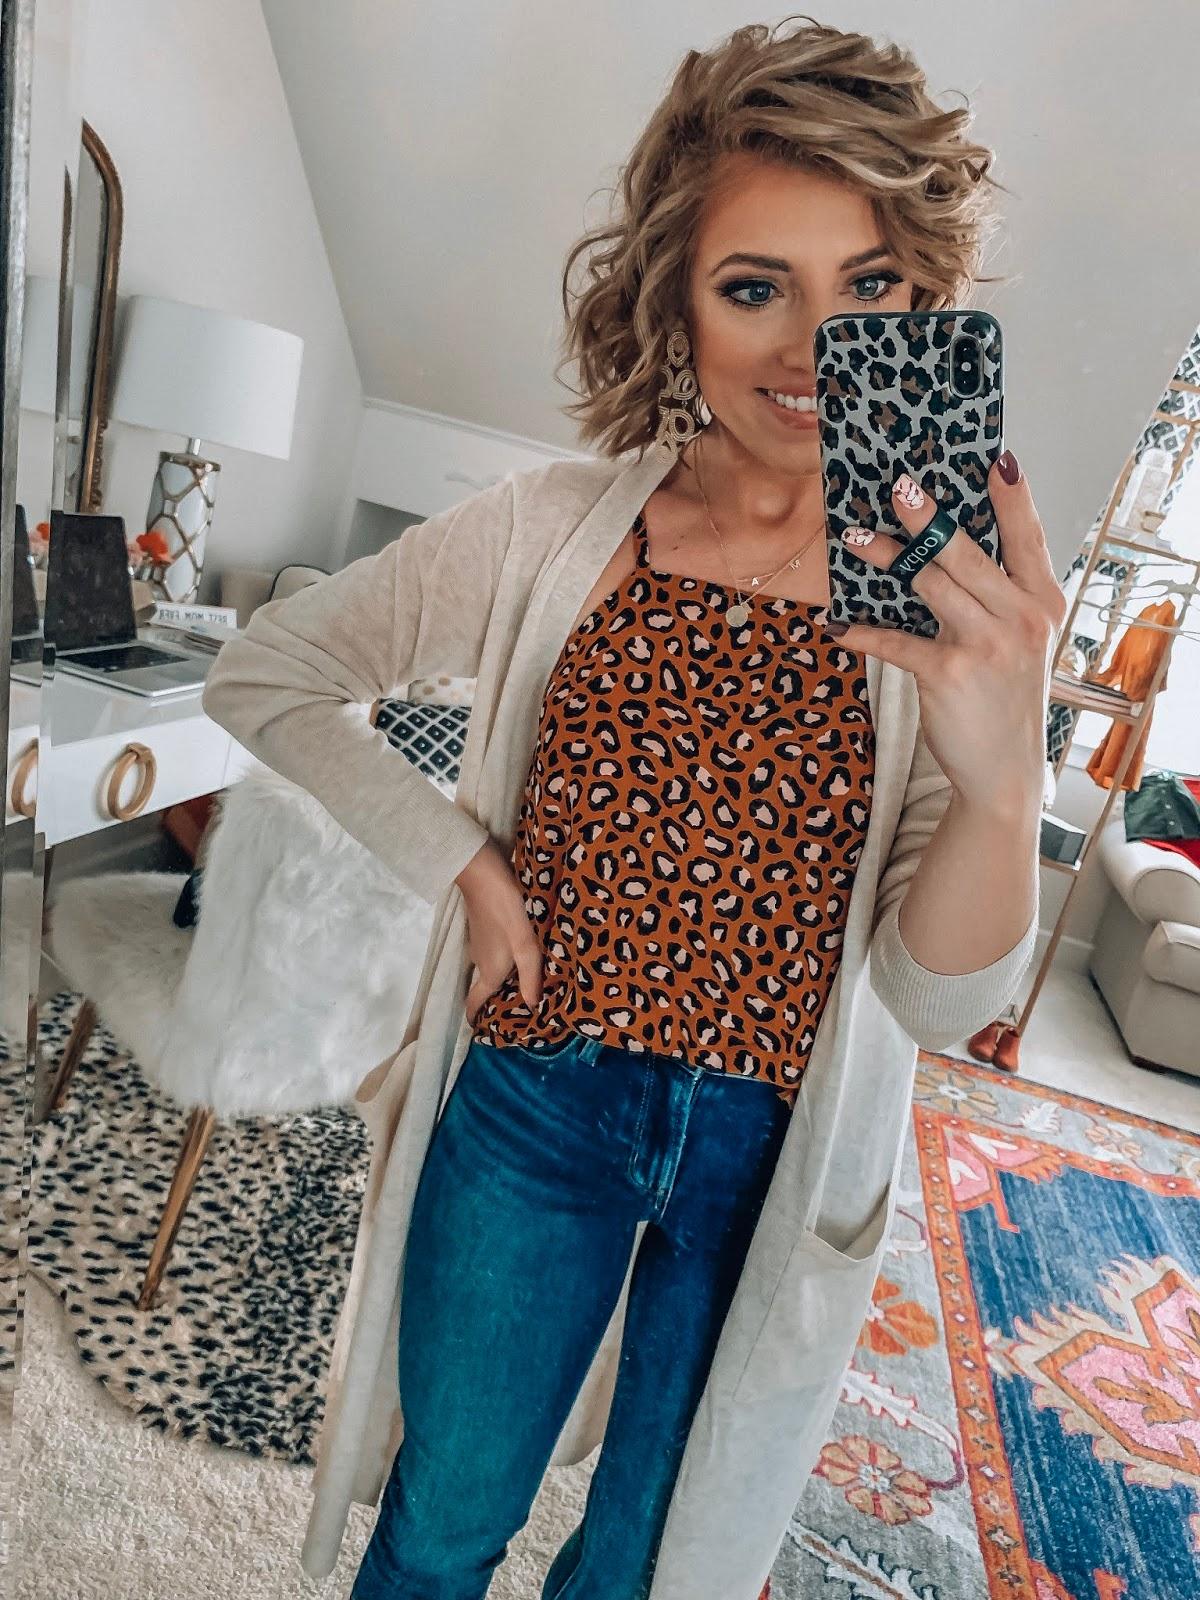 Old Navy High Waist 24/7 Rockstar Jeans + Leopard Print Cami and Target Style Cardigan - Somethig Delightful Blog #affordablefashion